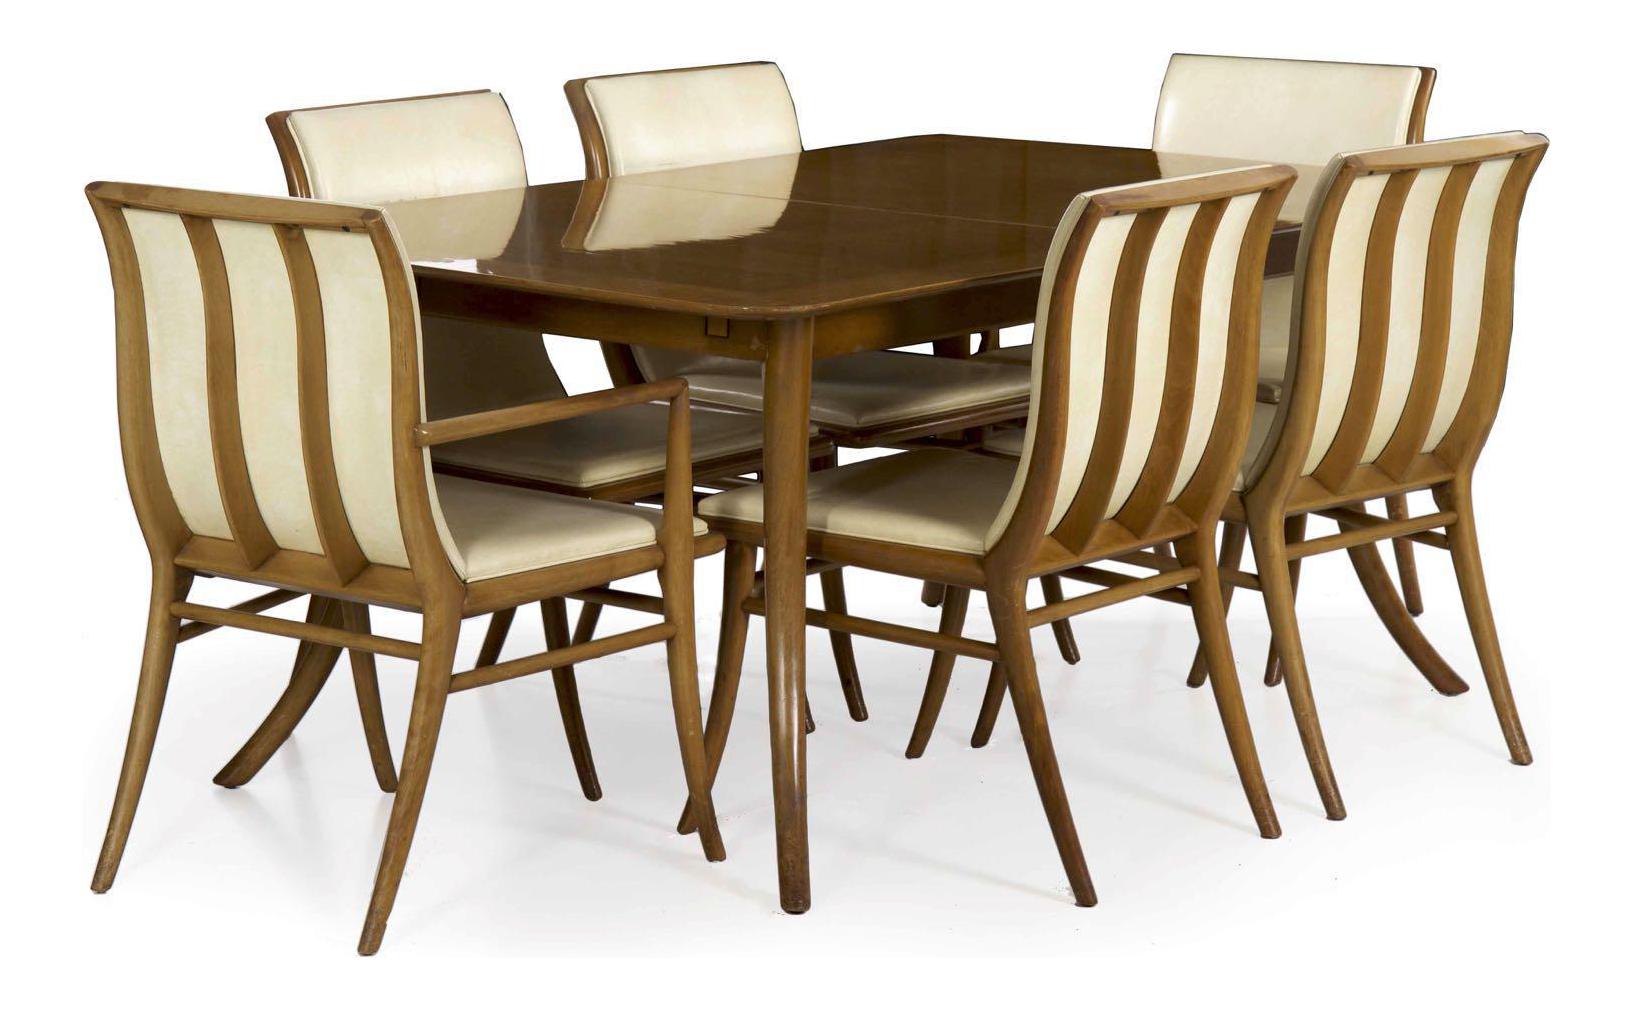 T.h. Robsjohn Gibbings For Widdicomb Walnut Dining Table W/ Six Chairs  Circa 1957